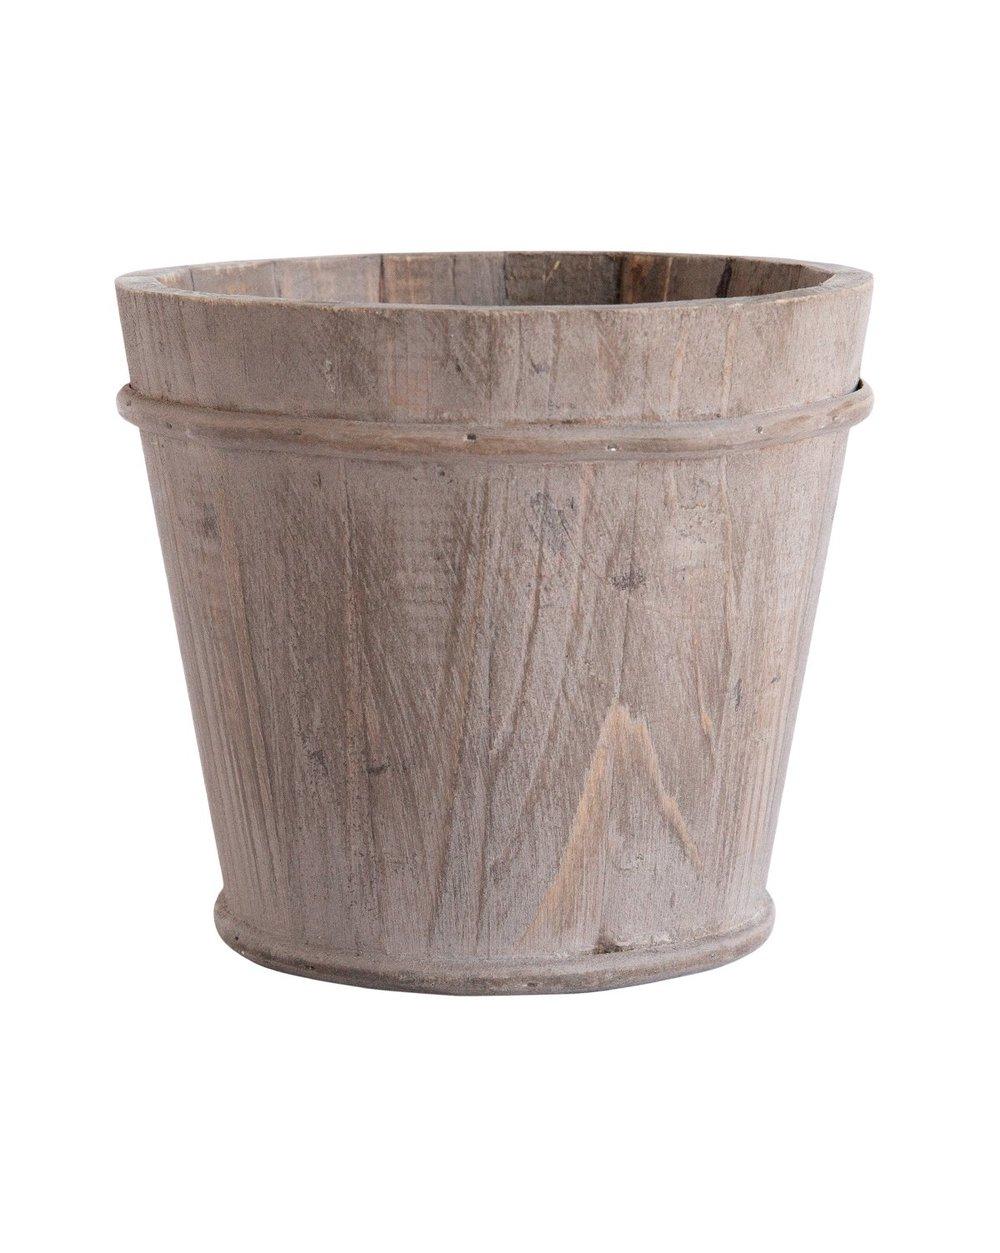 Aged_Wood_Pot_1.jpg